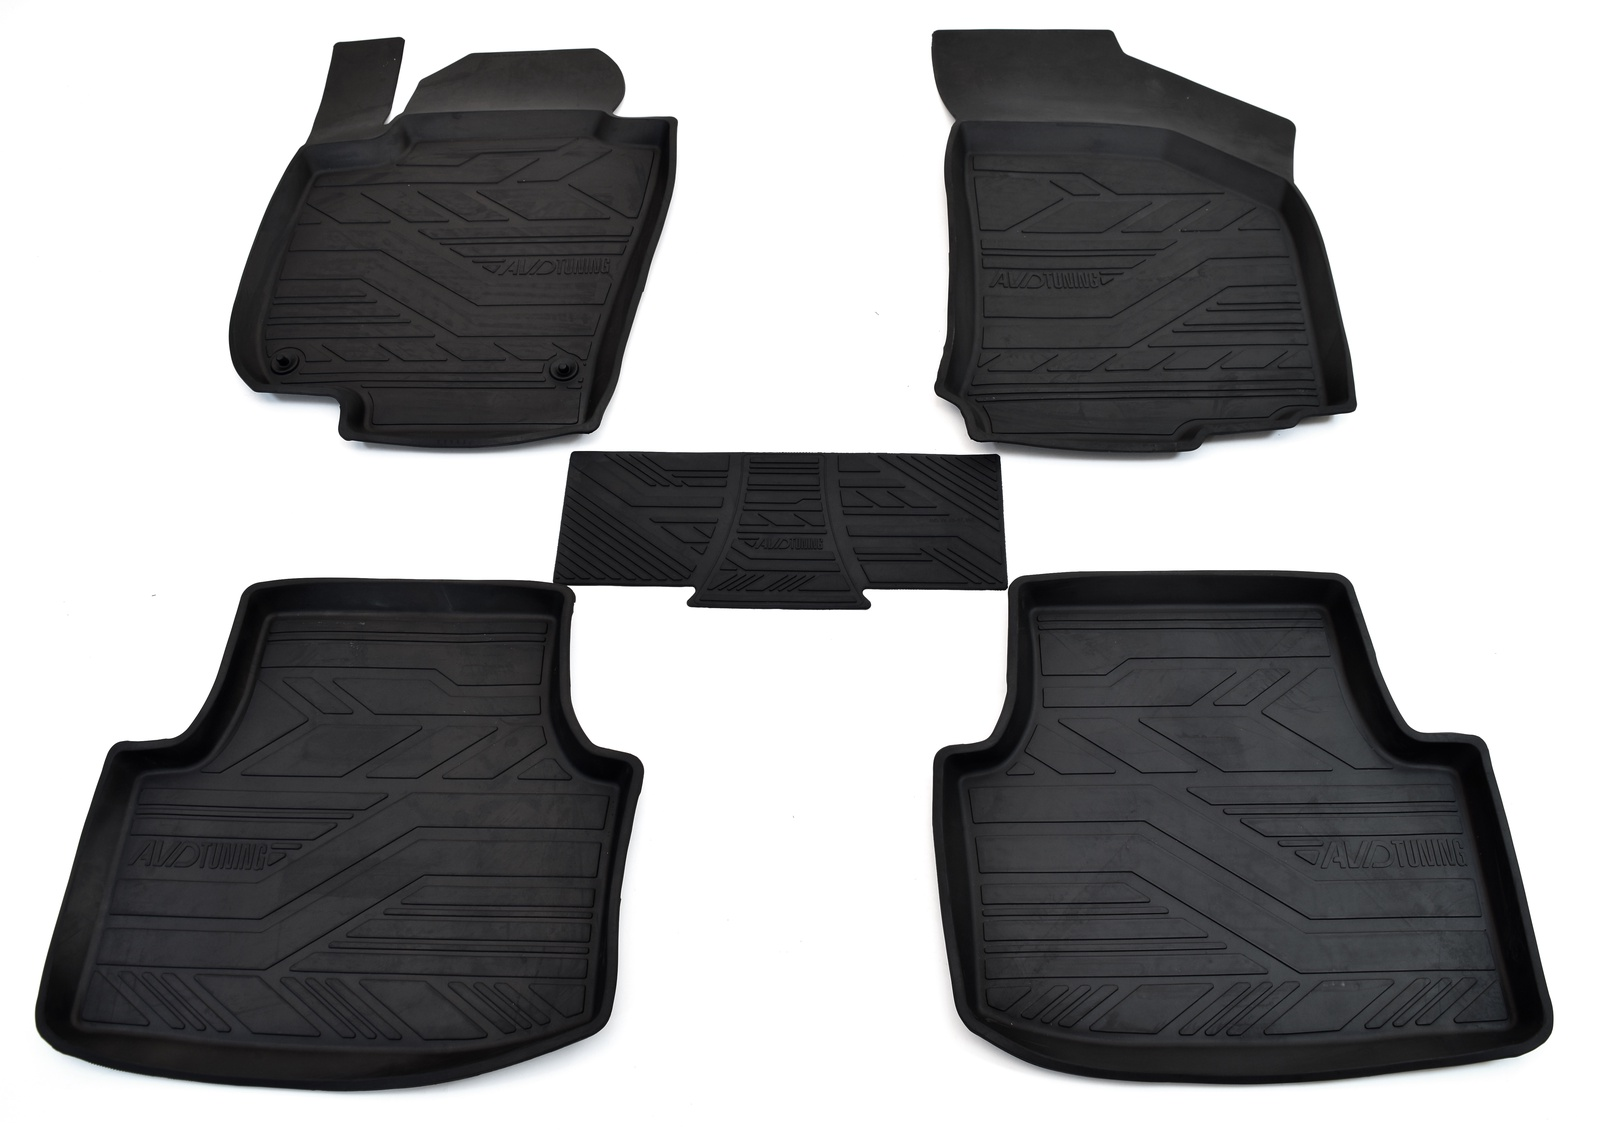 Коврик багажника для hyundai tucson (tl) (2015-) (полимер) npa00-e31-560 коврик багажника norplast для jeep grand cherokee wk 2010 npa00 t40 100 b бежевый